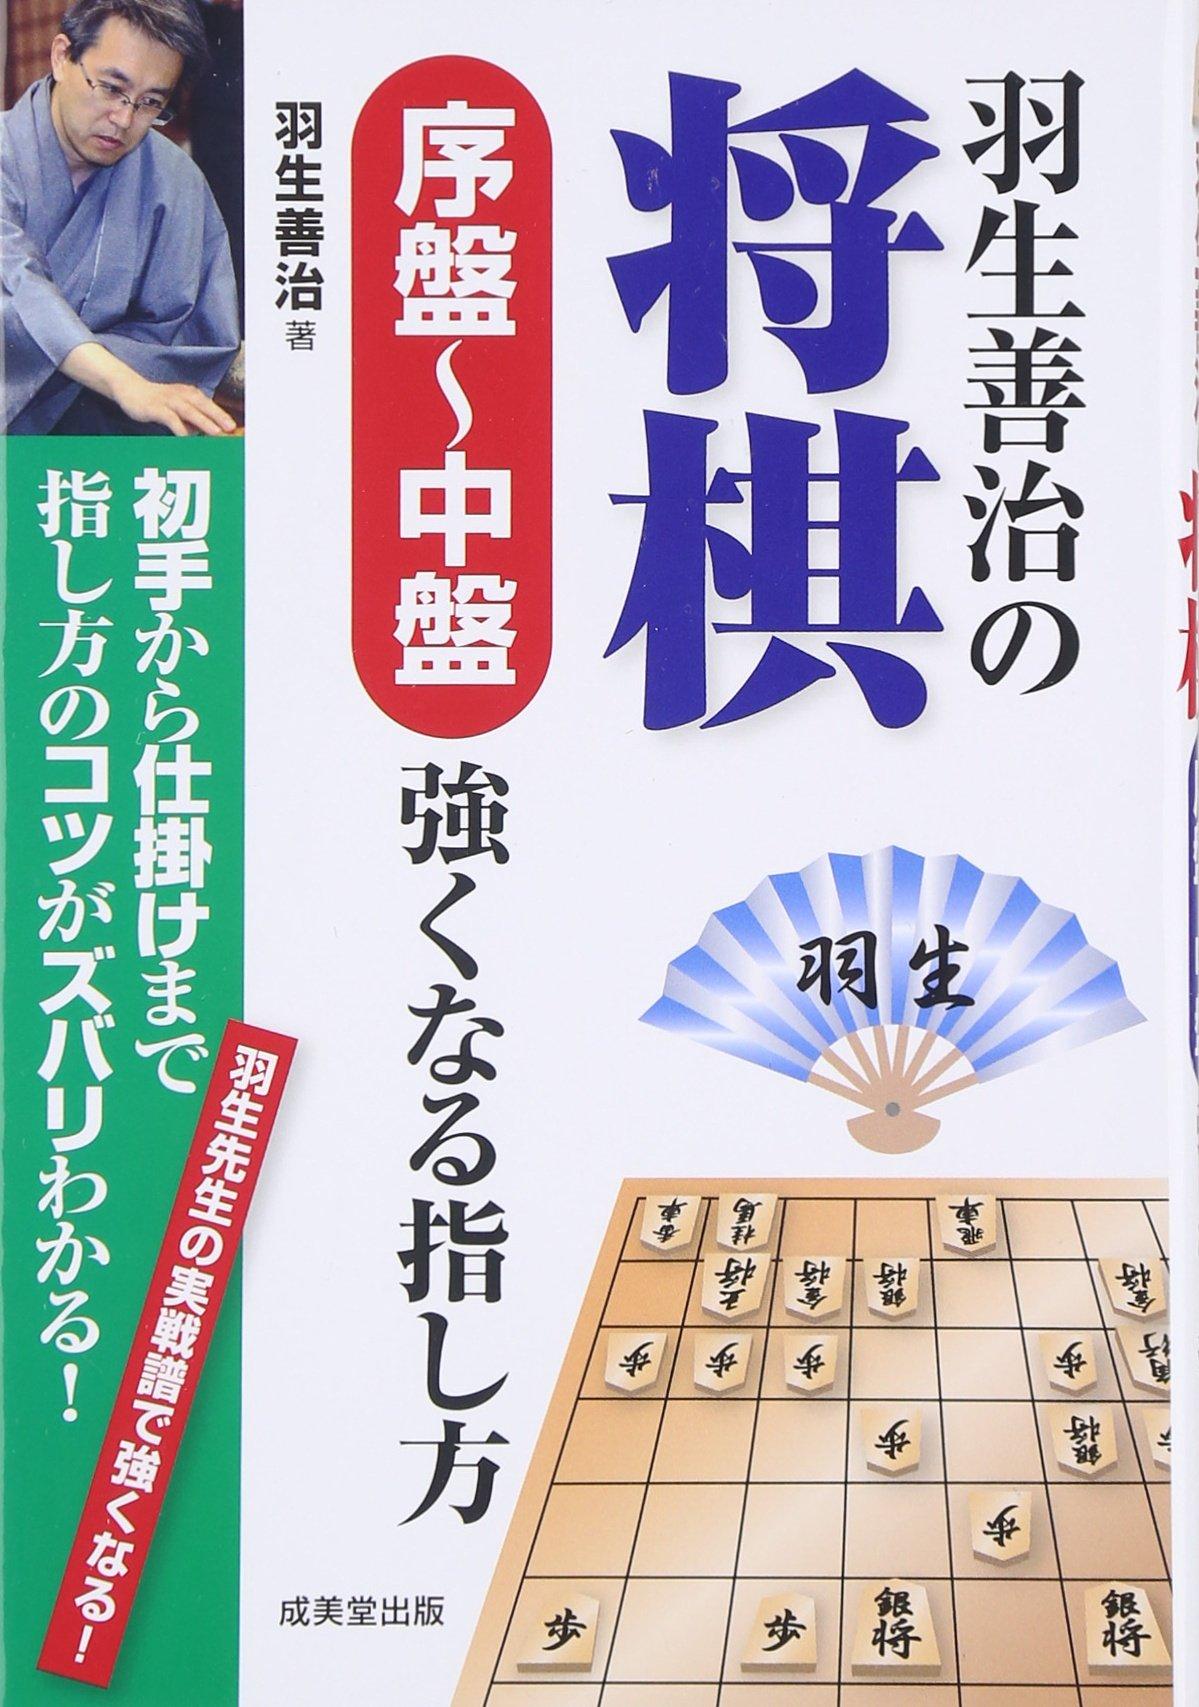 Mua 羽生善治の将棋 序盤~中盤 強くなる指し方 trên Amazon Nhật chính ...